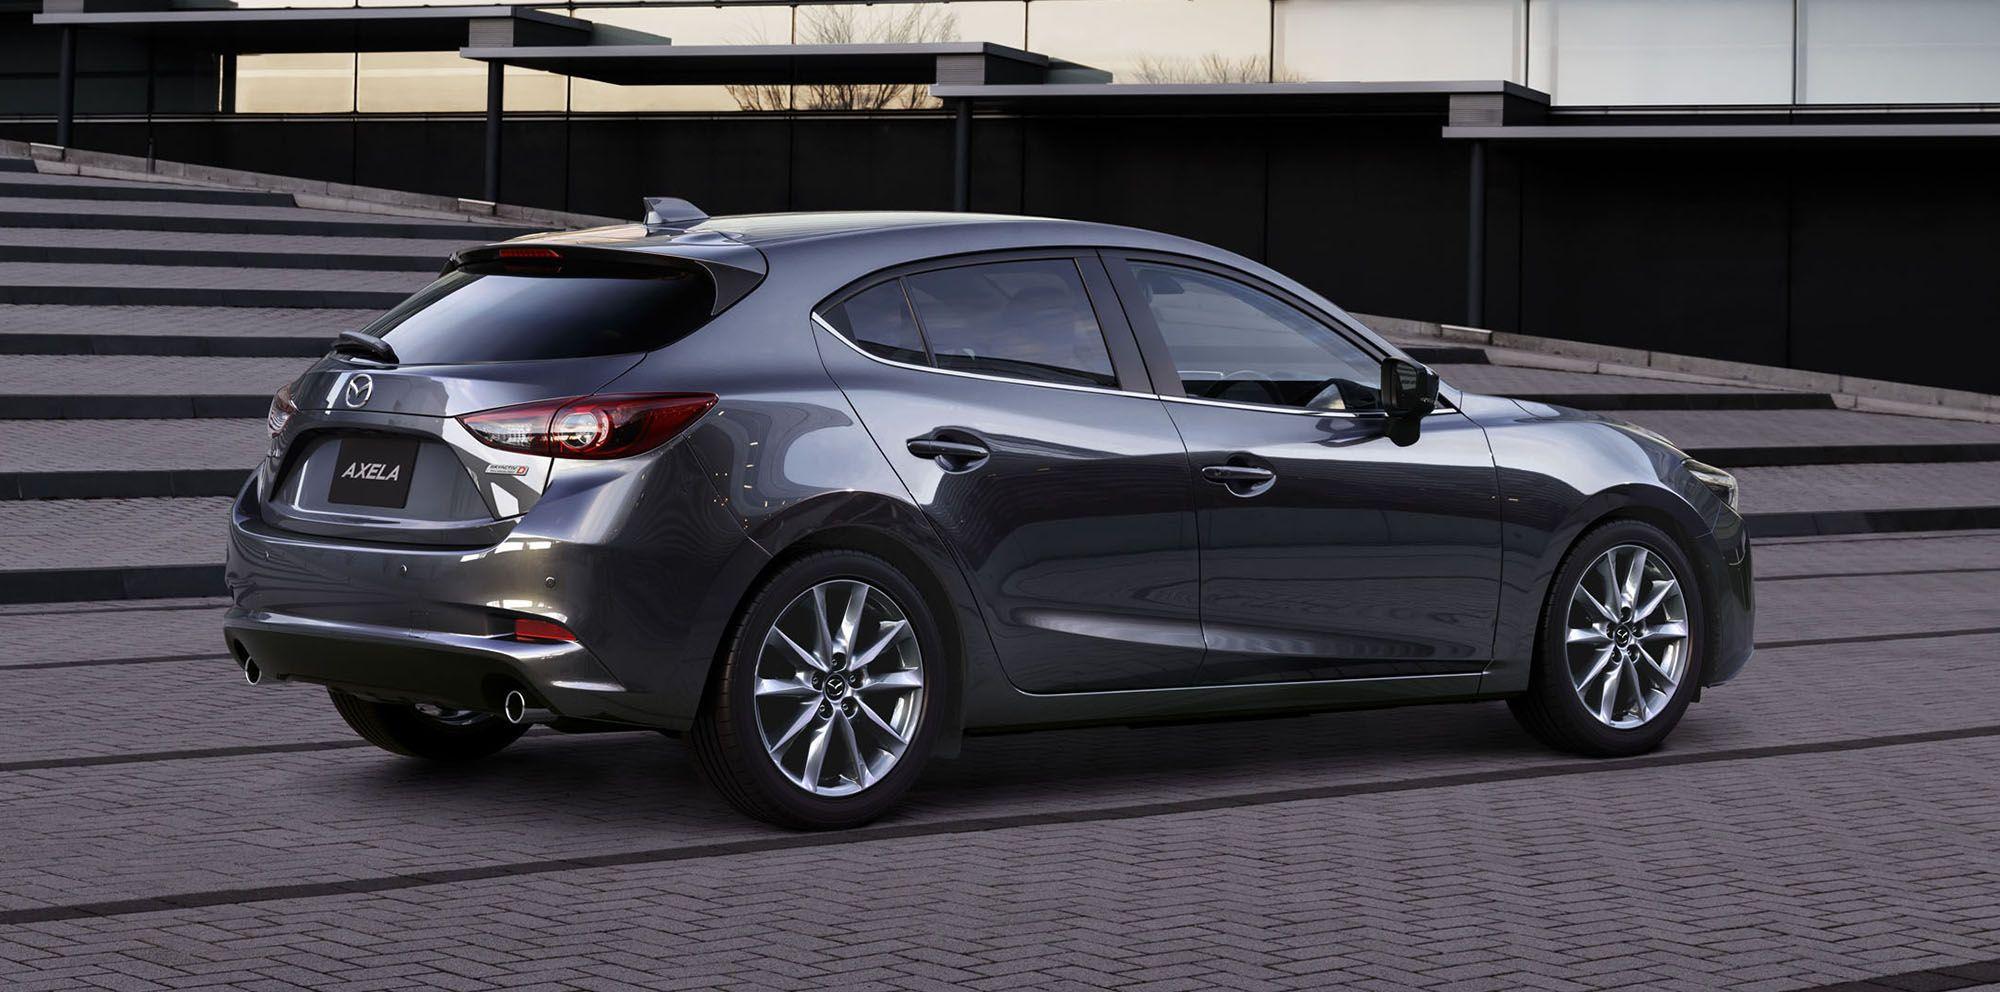 Mazda 3 hatch rear jpg 2000 992